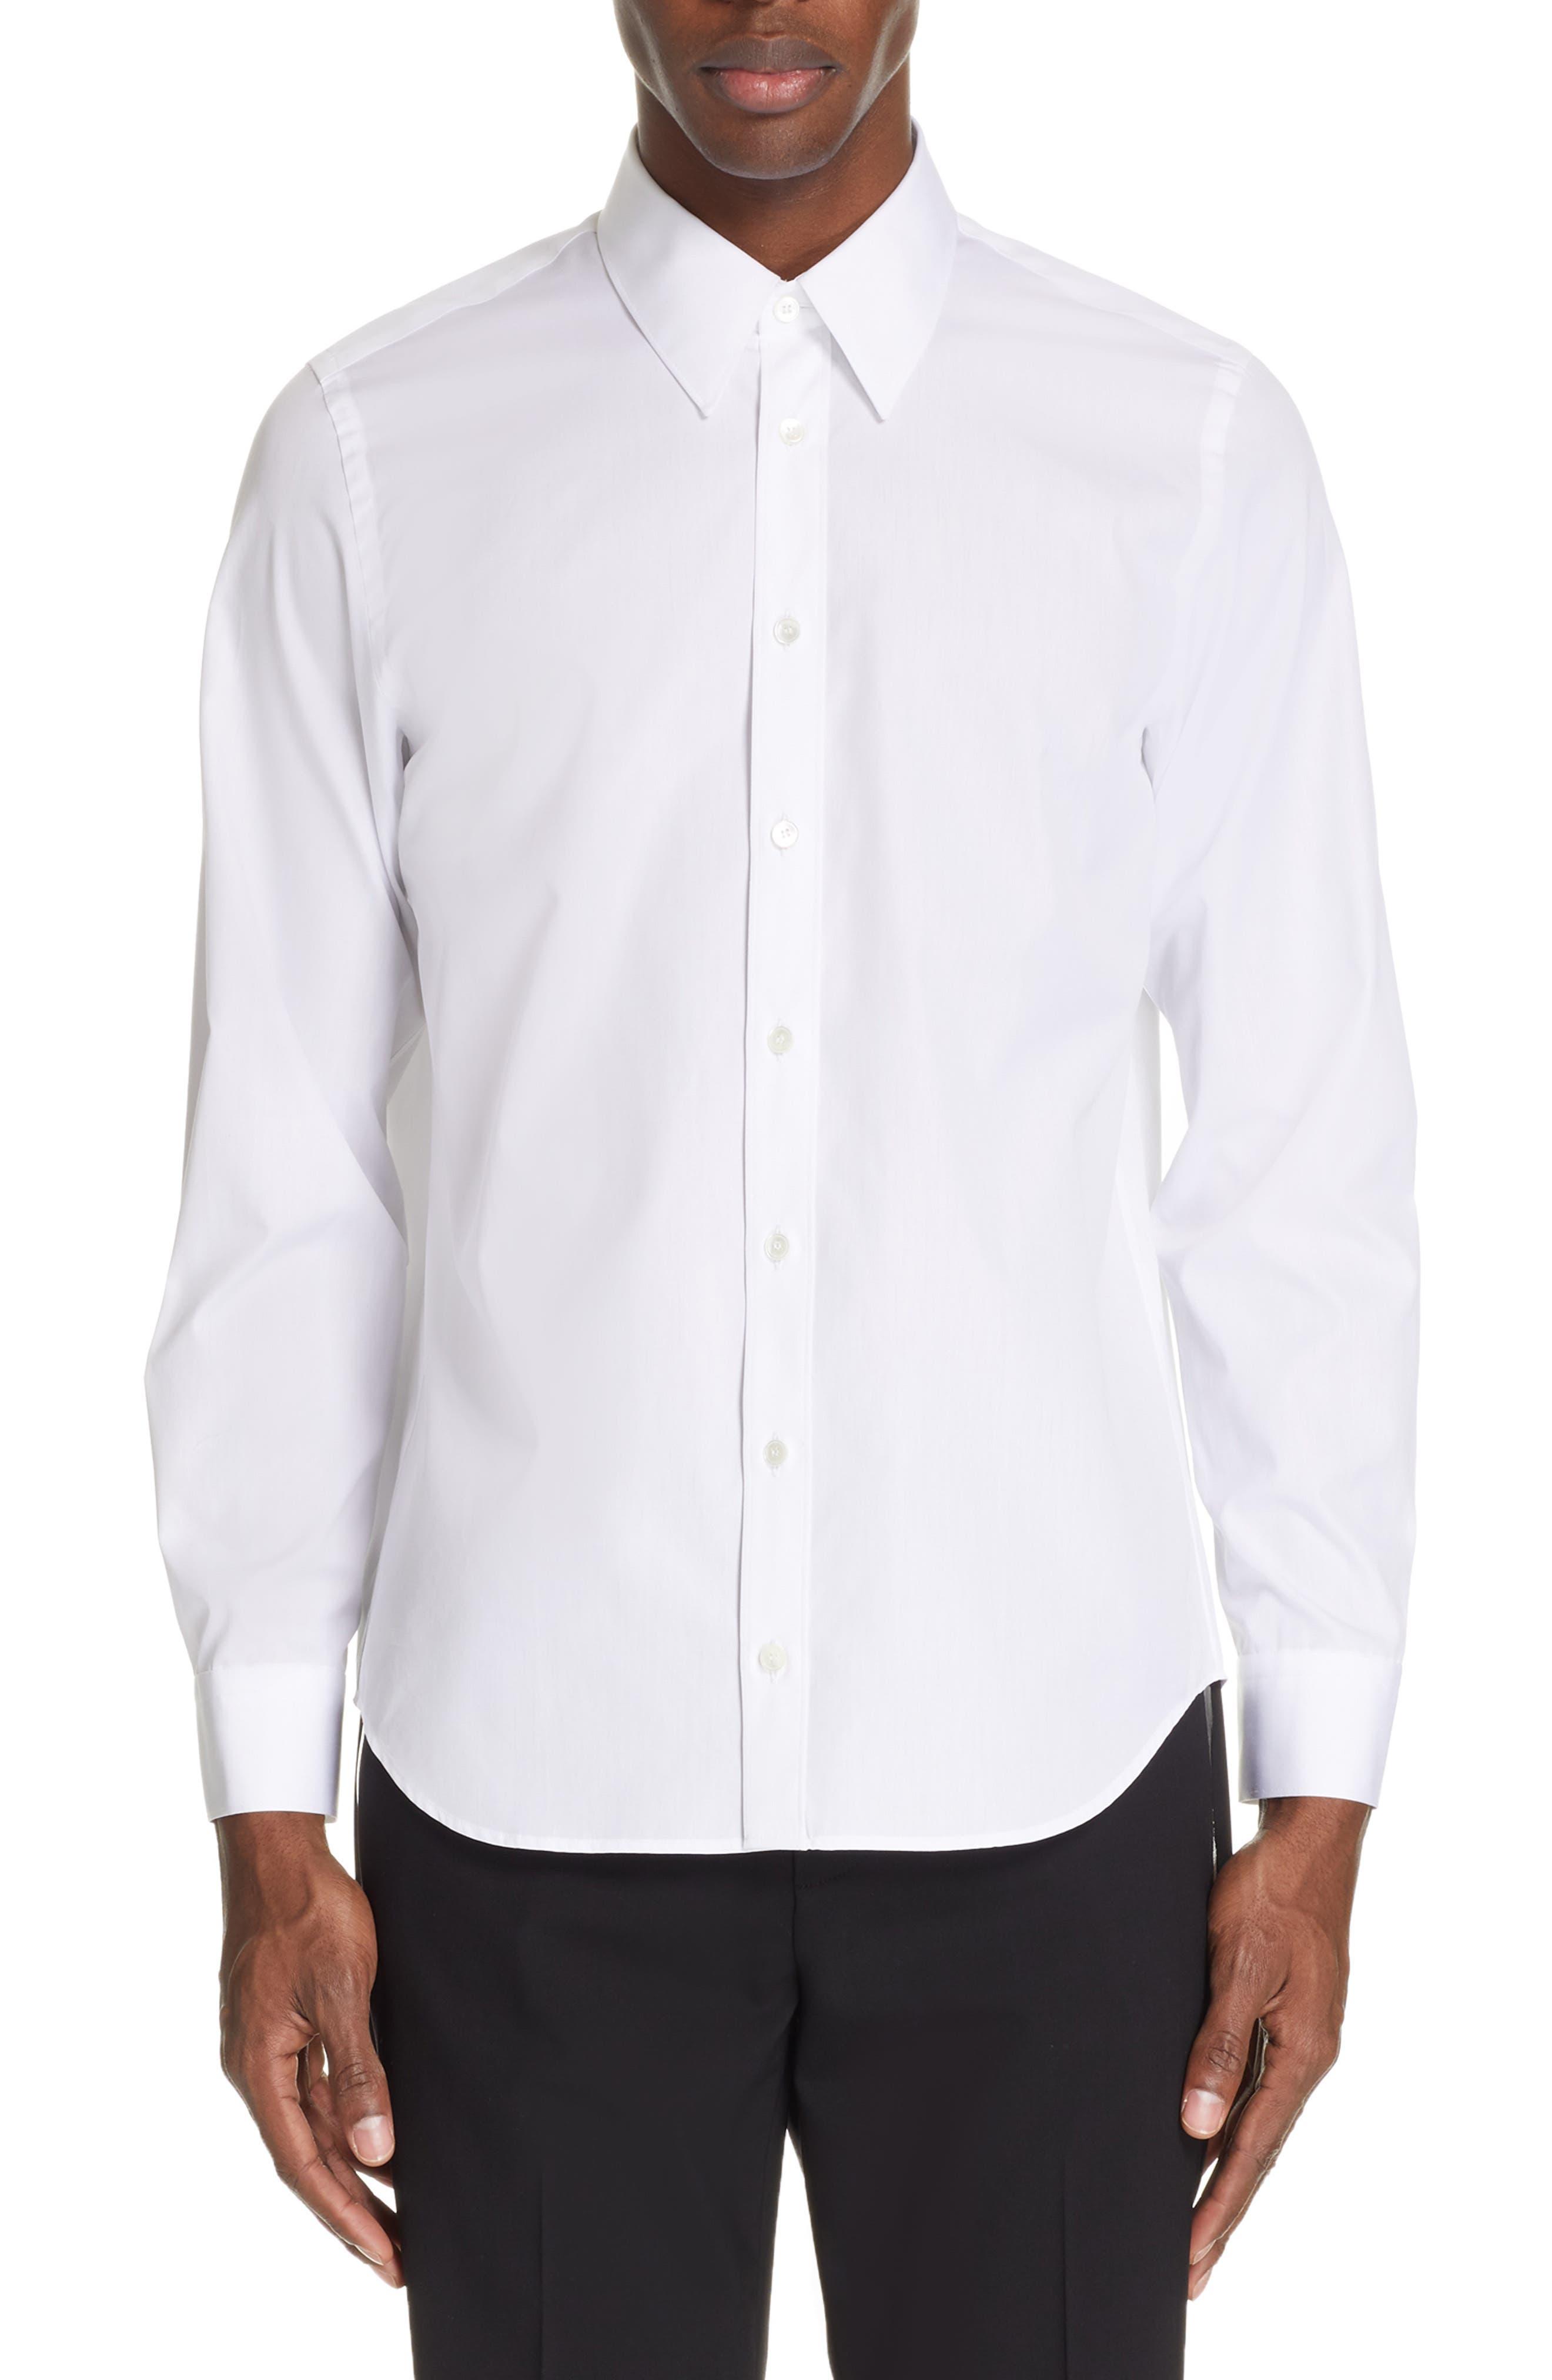 HELMUT LANG, Logo Back Long Sleeve Woven Shirt, Main thumbnail 1, color, WHITE AND BLACK